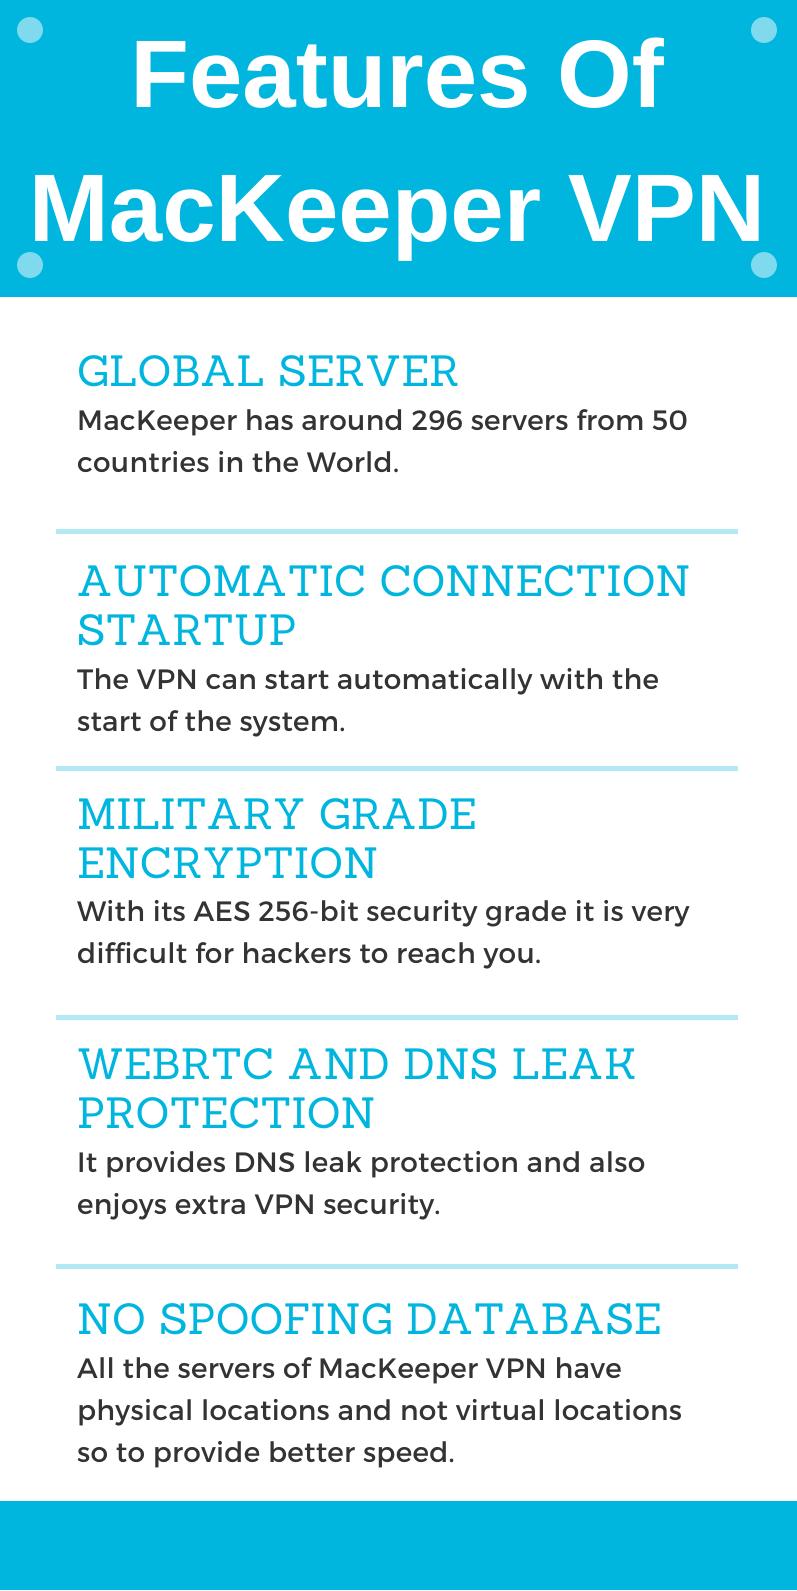 MacKeeper Promo Code - Features OF MacKeeper VPN